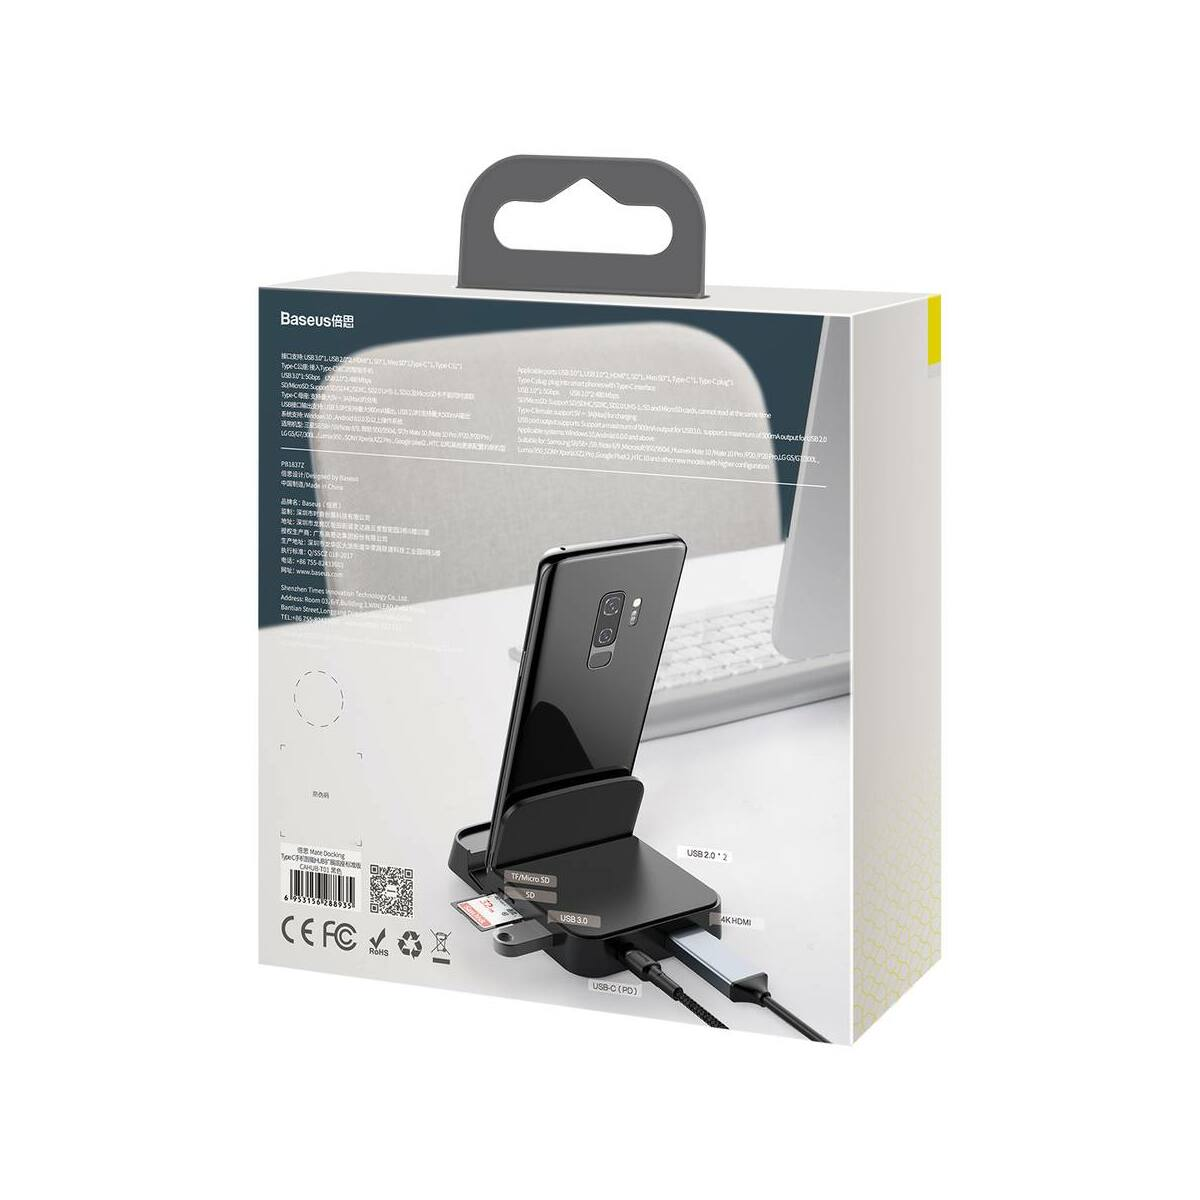 Baseus HUB, 7-in-1 Mate Dokkoló (Type-C bemenetr+C607:C647ől - 1xUSB3.0/2xUSB2.0/HDMI/SD/MicroSD/Type-C), fekete (CAHUB-AT01)